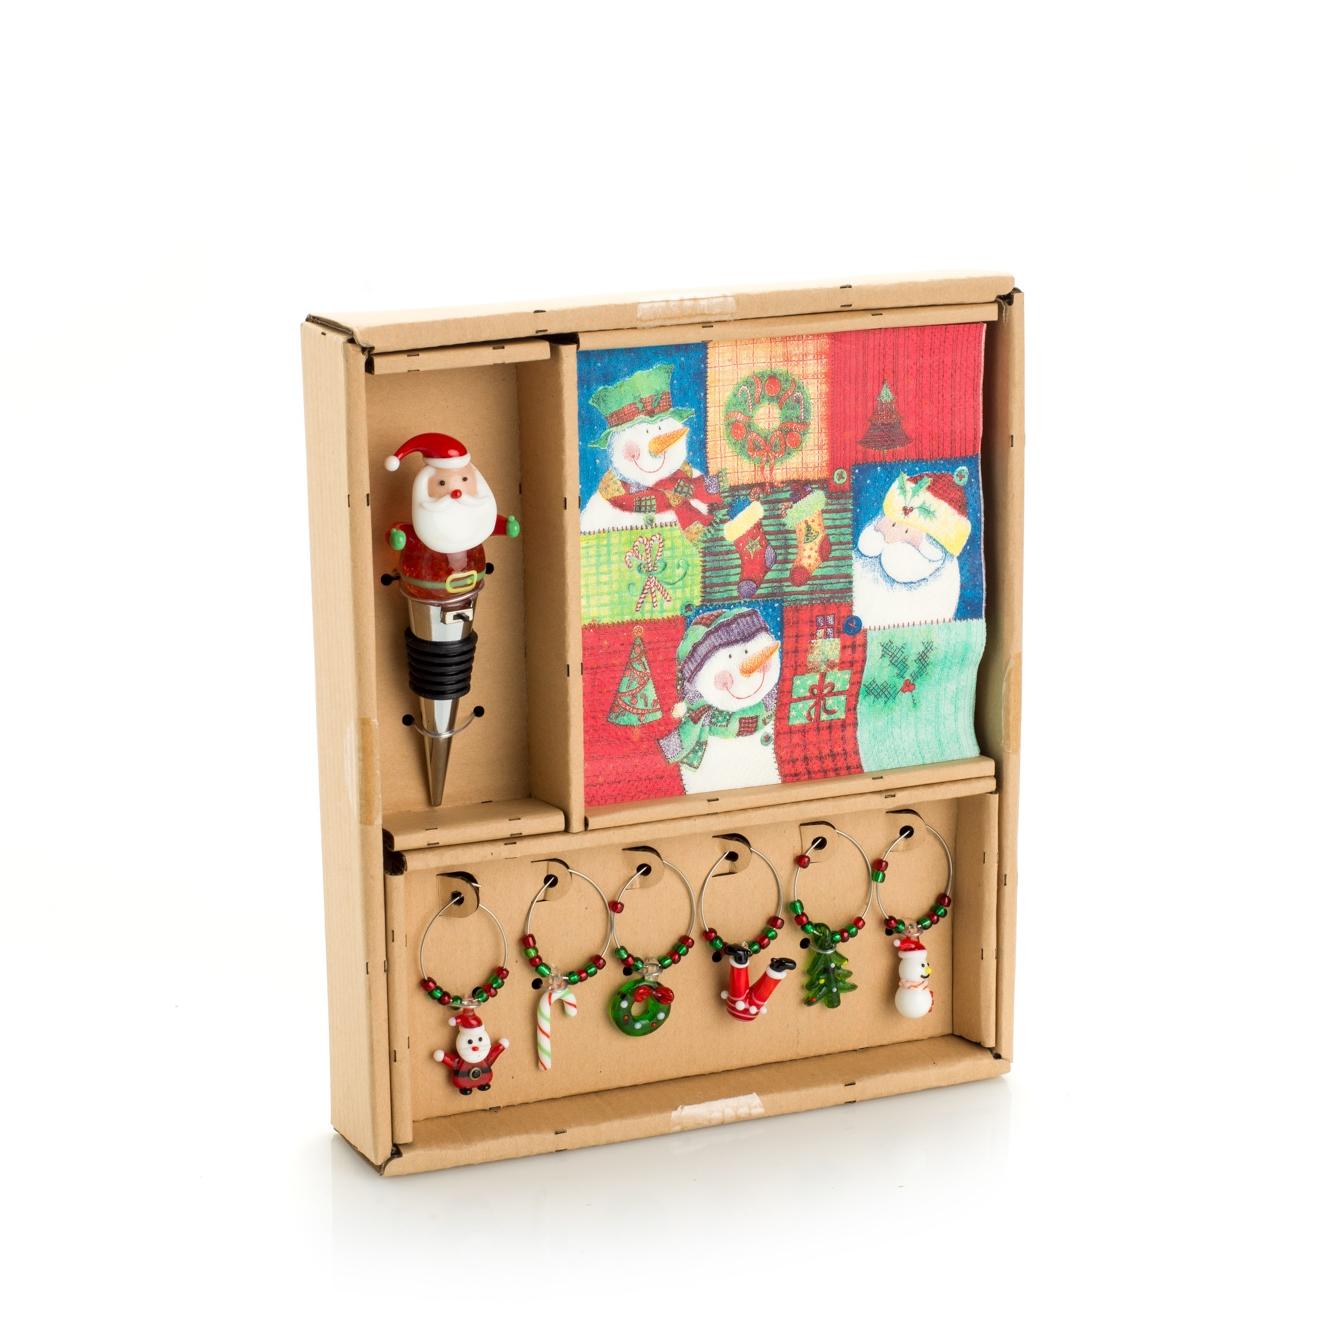 Set Vino Babbo Natale  - Tappo Babbo Con Led - Tovaglioli - 6 Segna Bicchieri